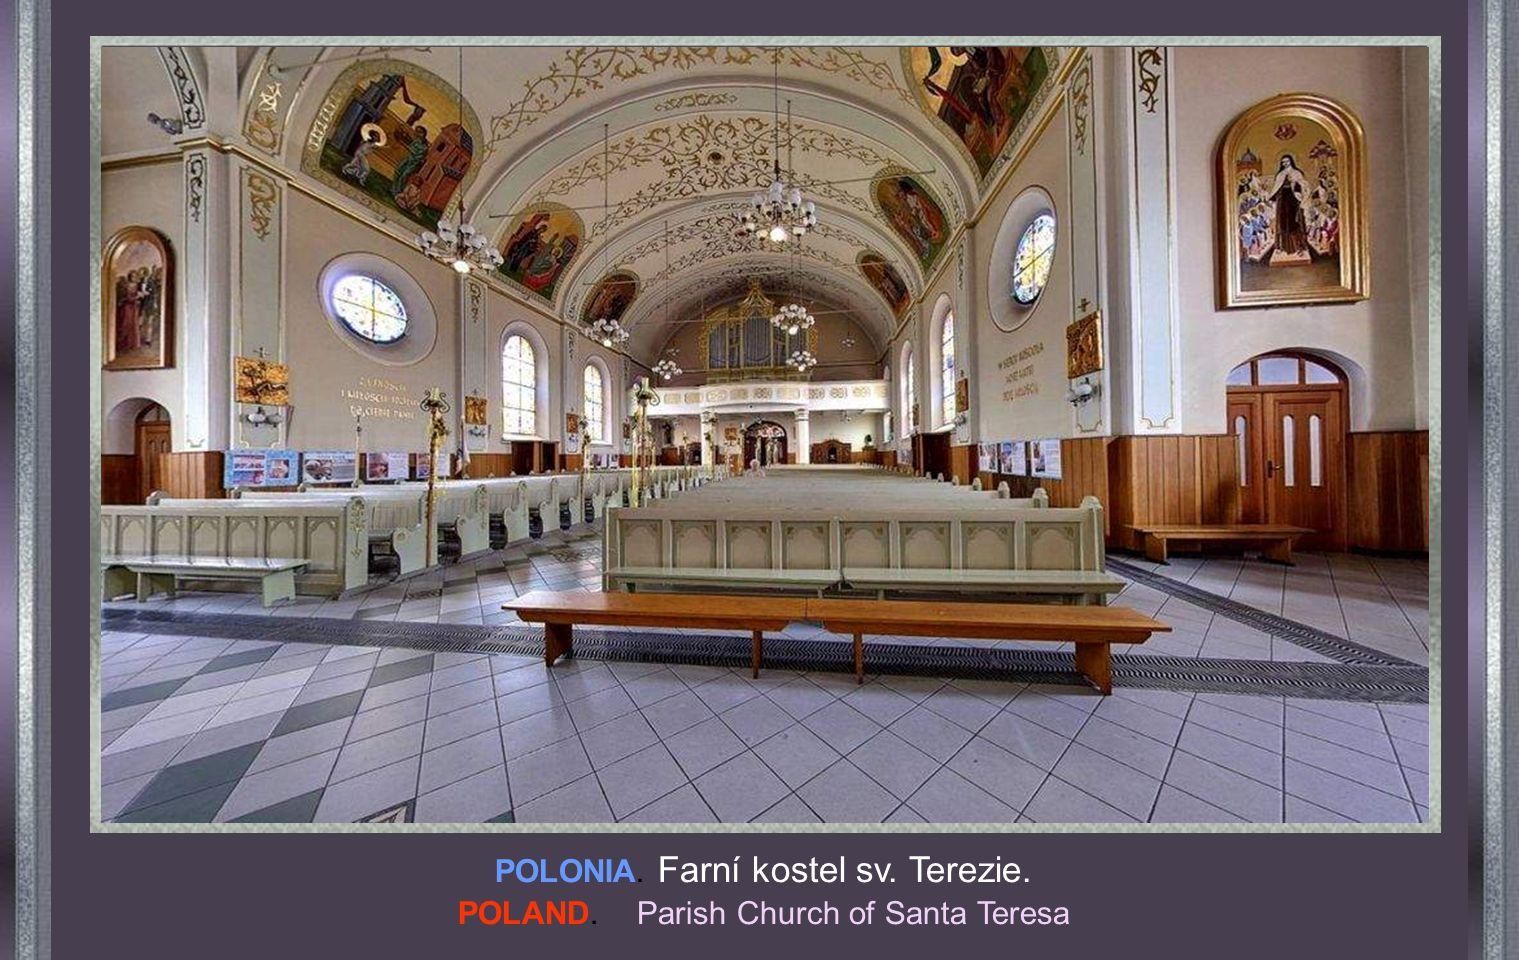 PRAGA. Praha. Chrám sv. Mikuláše. PRAGUE. Church of San Nicolas